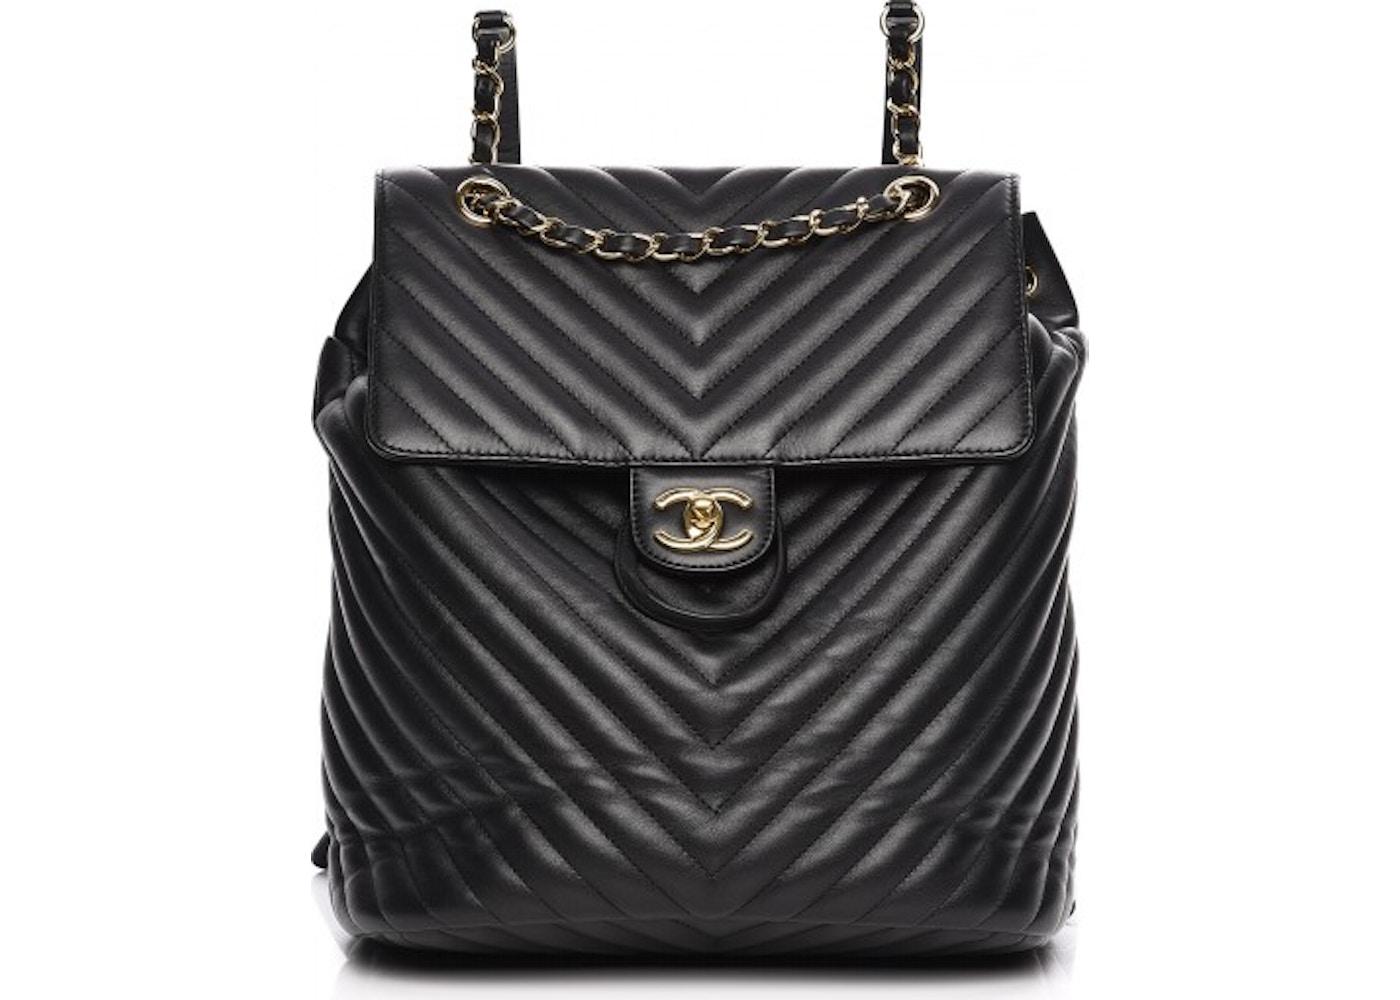 4bdf9dece189 Chanel Urban Spirit Backpack Chevron Quilted Large. Chevron Quilted Large